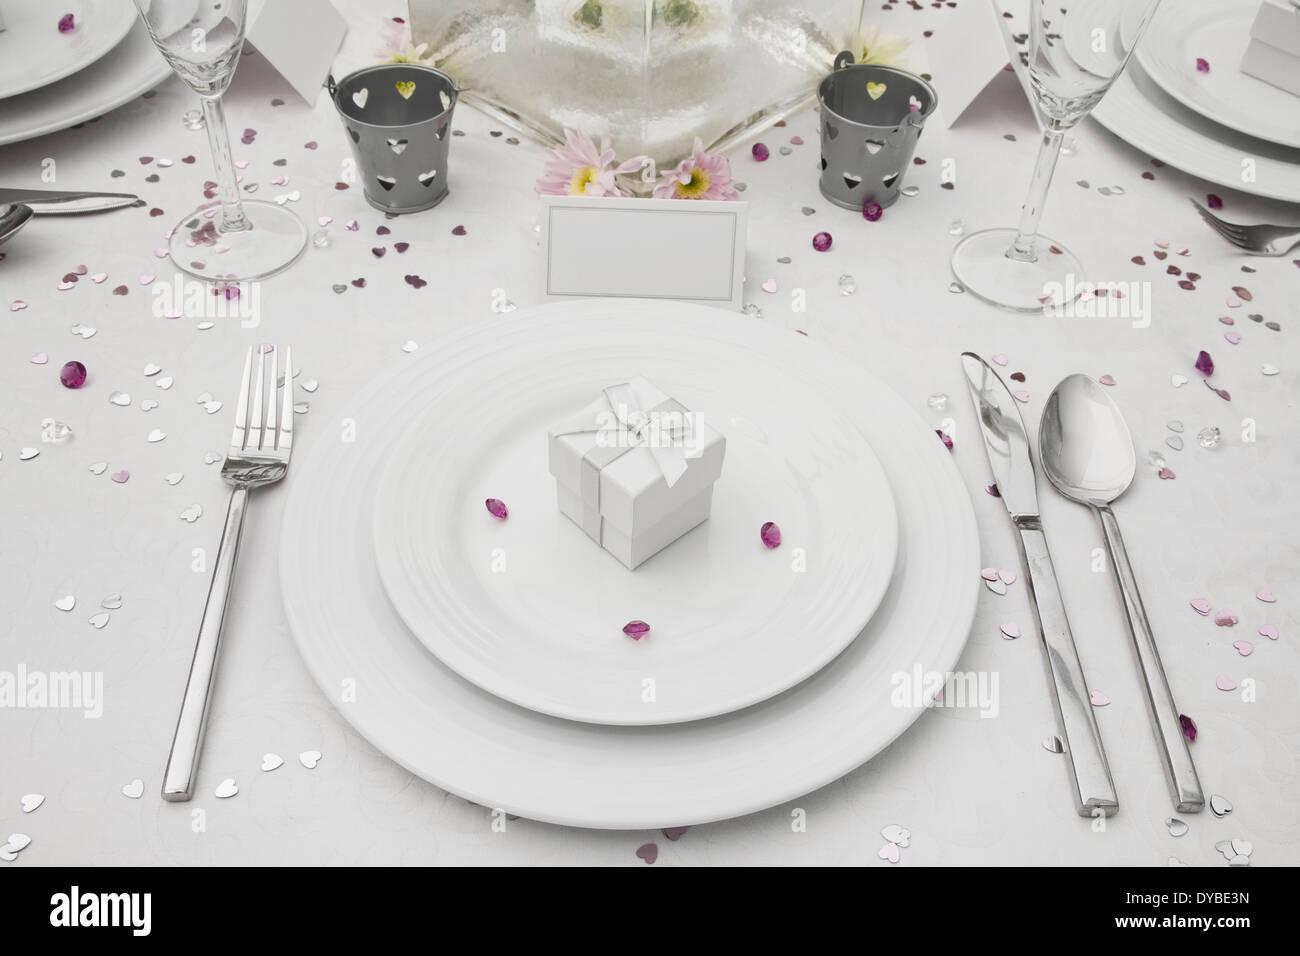 Wedding Table Display Wedding Favor Stock Photos & Wedding Table ...